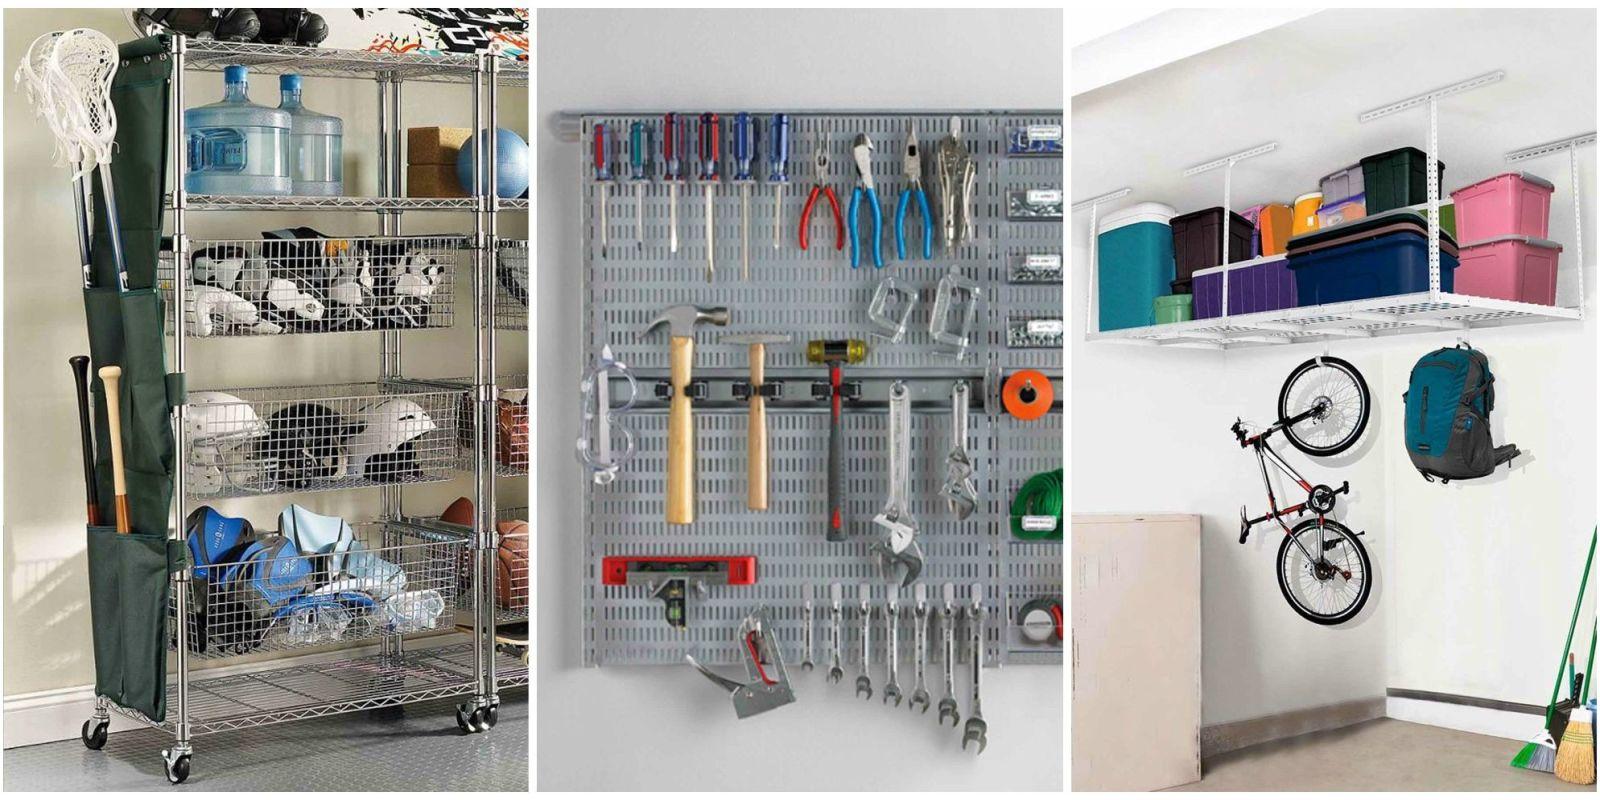 24 Garage Organization Ideas - Storage Solutions and Tips ... on Organized Garage  id=14514